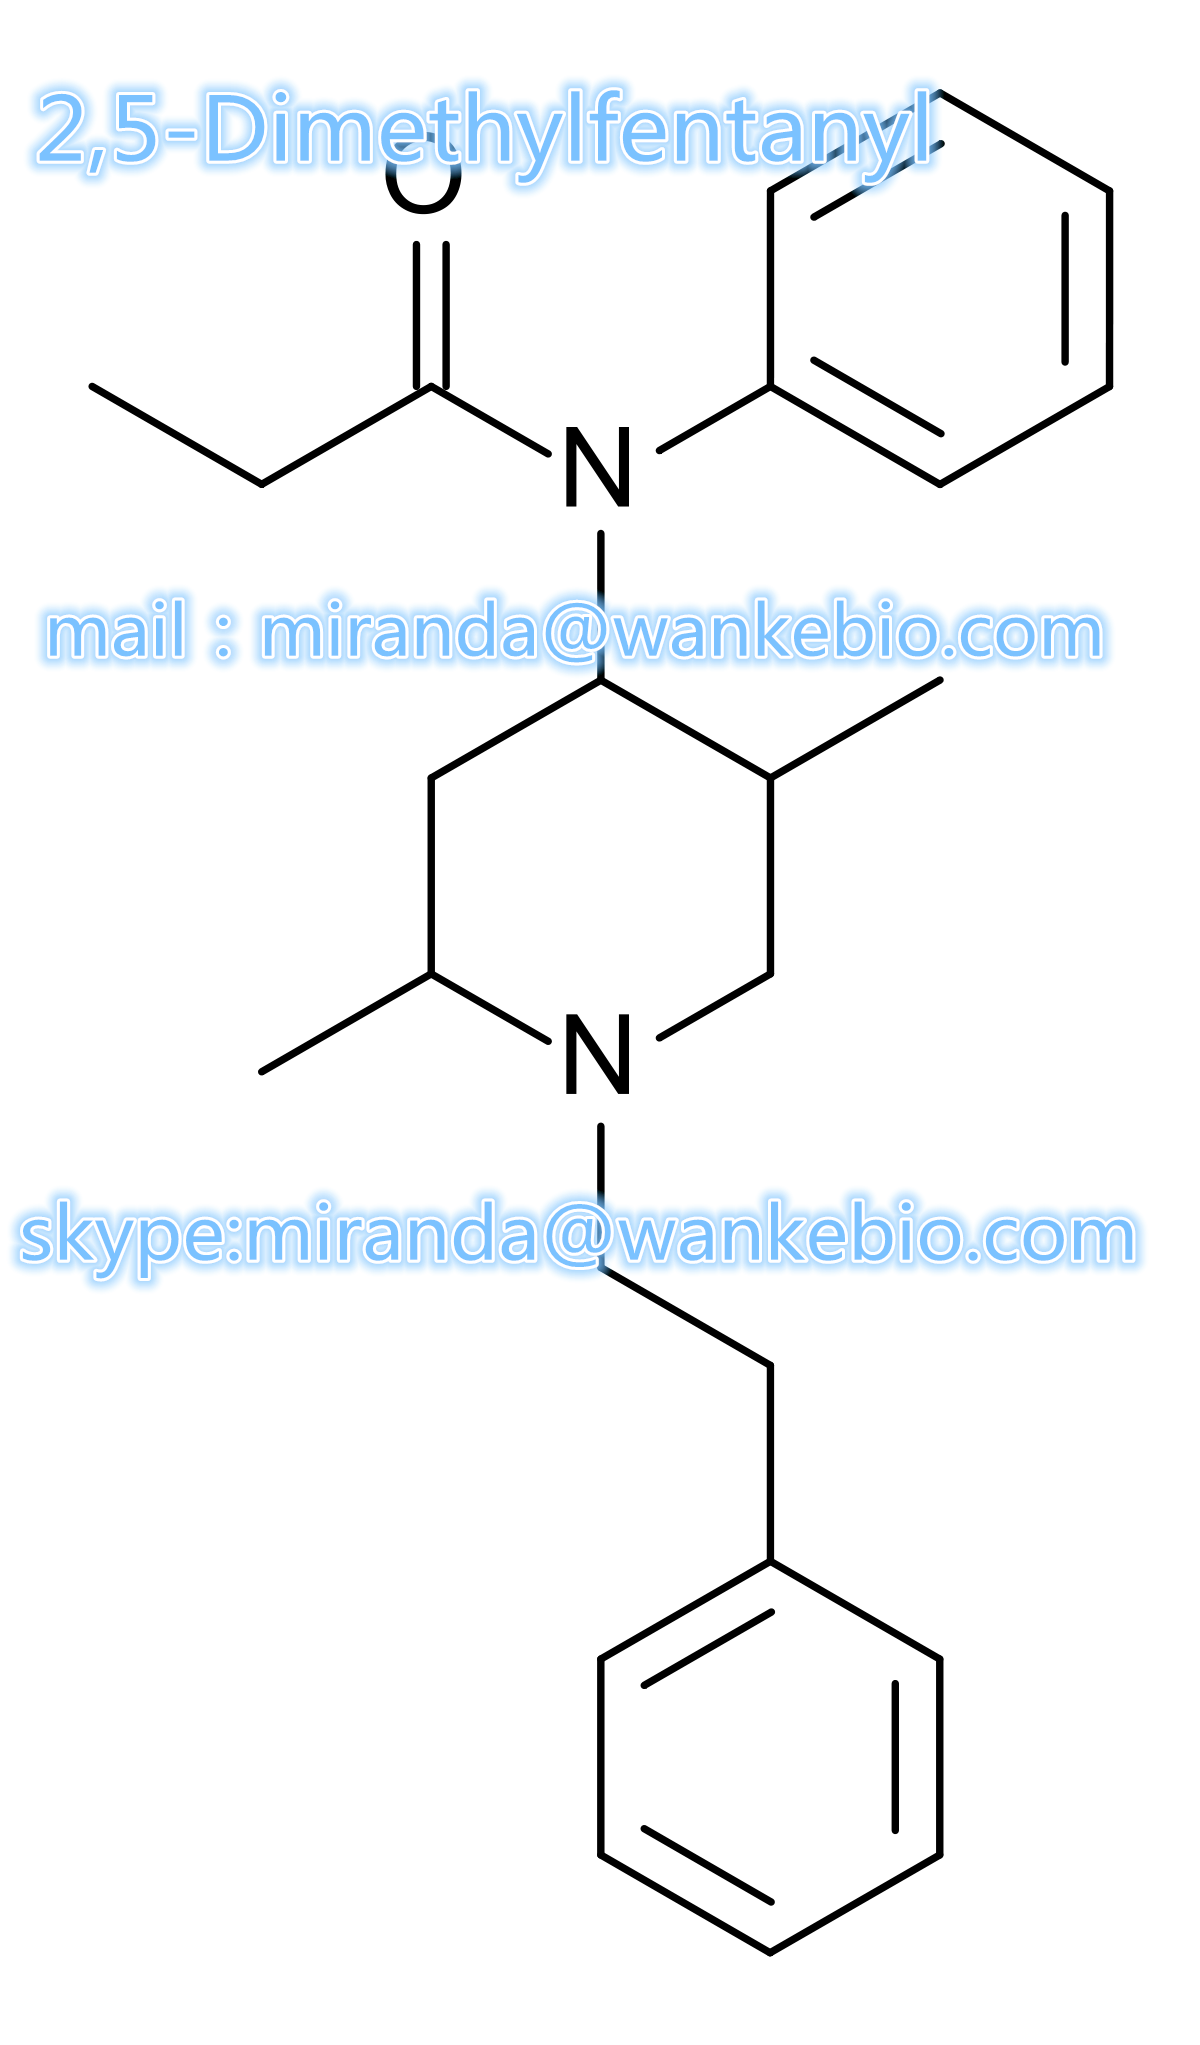 a 2,5-Dimethylfentanyl Phenaridine 42045-97-6 C24H32N2O mail/skype miranda at wankebio com